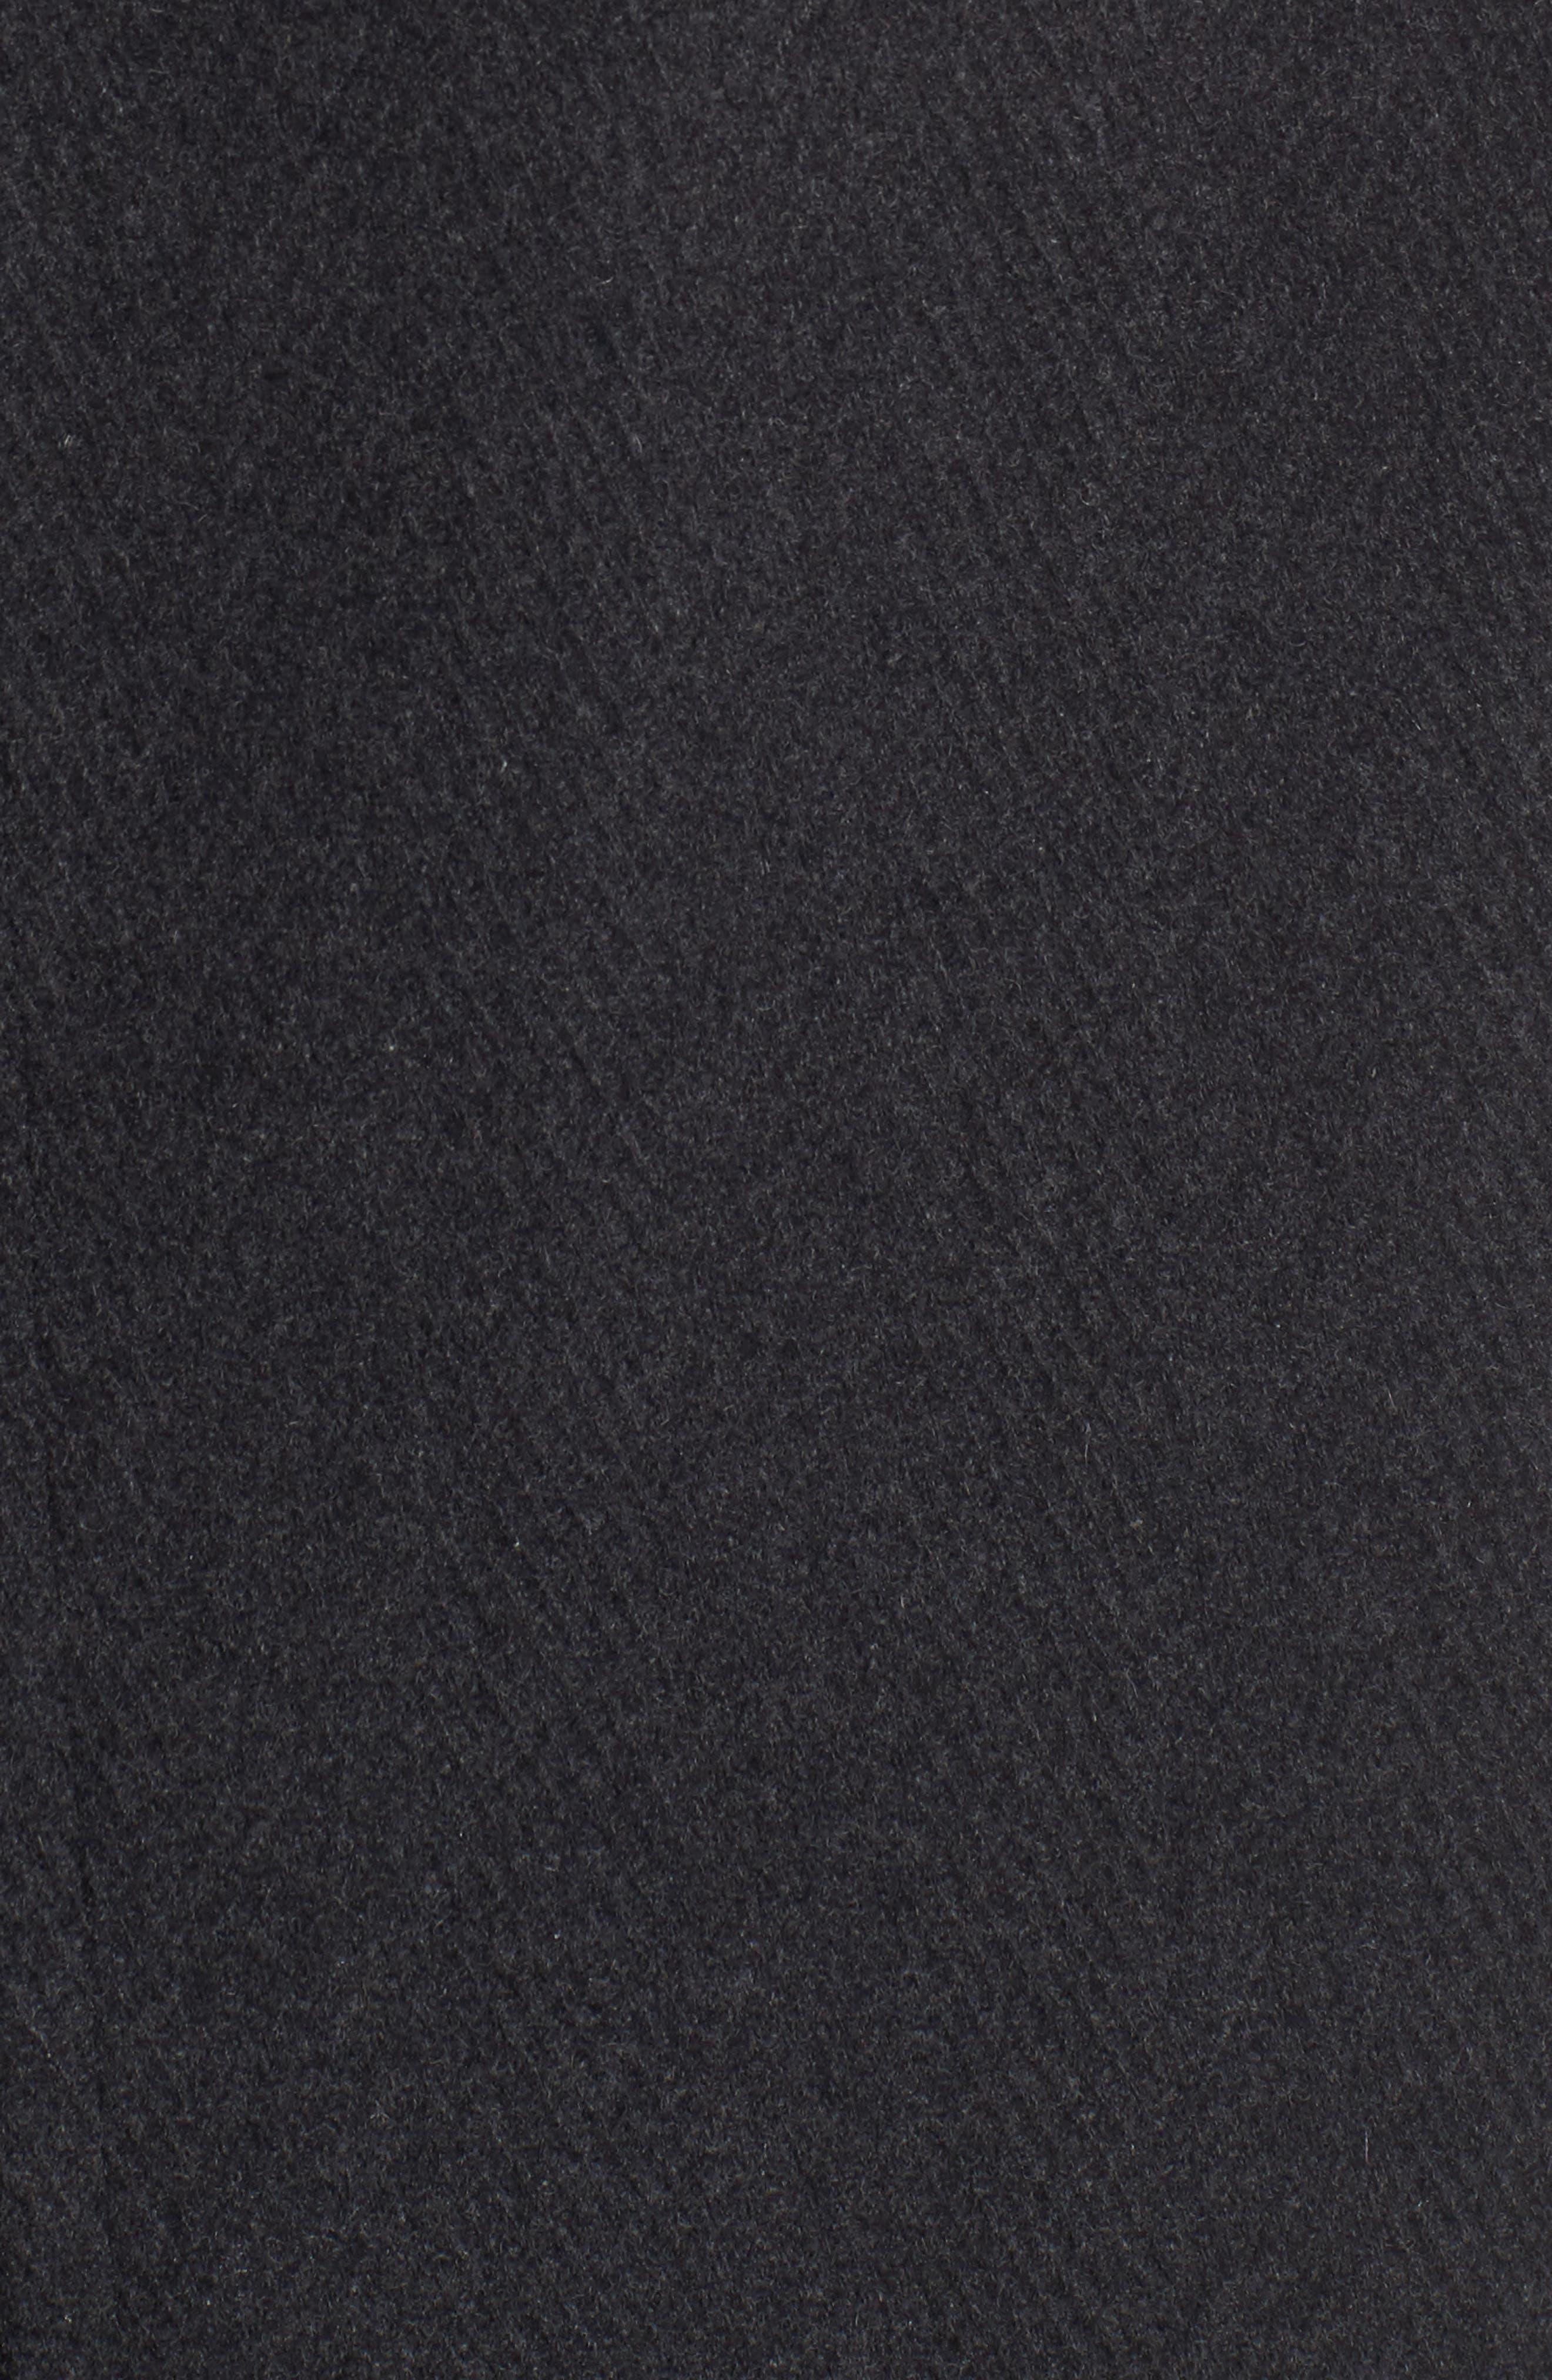 Herringbone Wool Blend Car Coat,                             Alternate thumbnail 9, color,